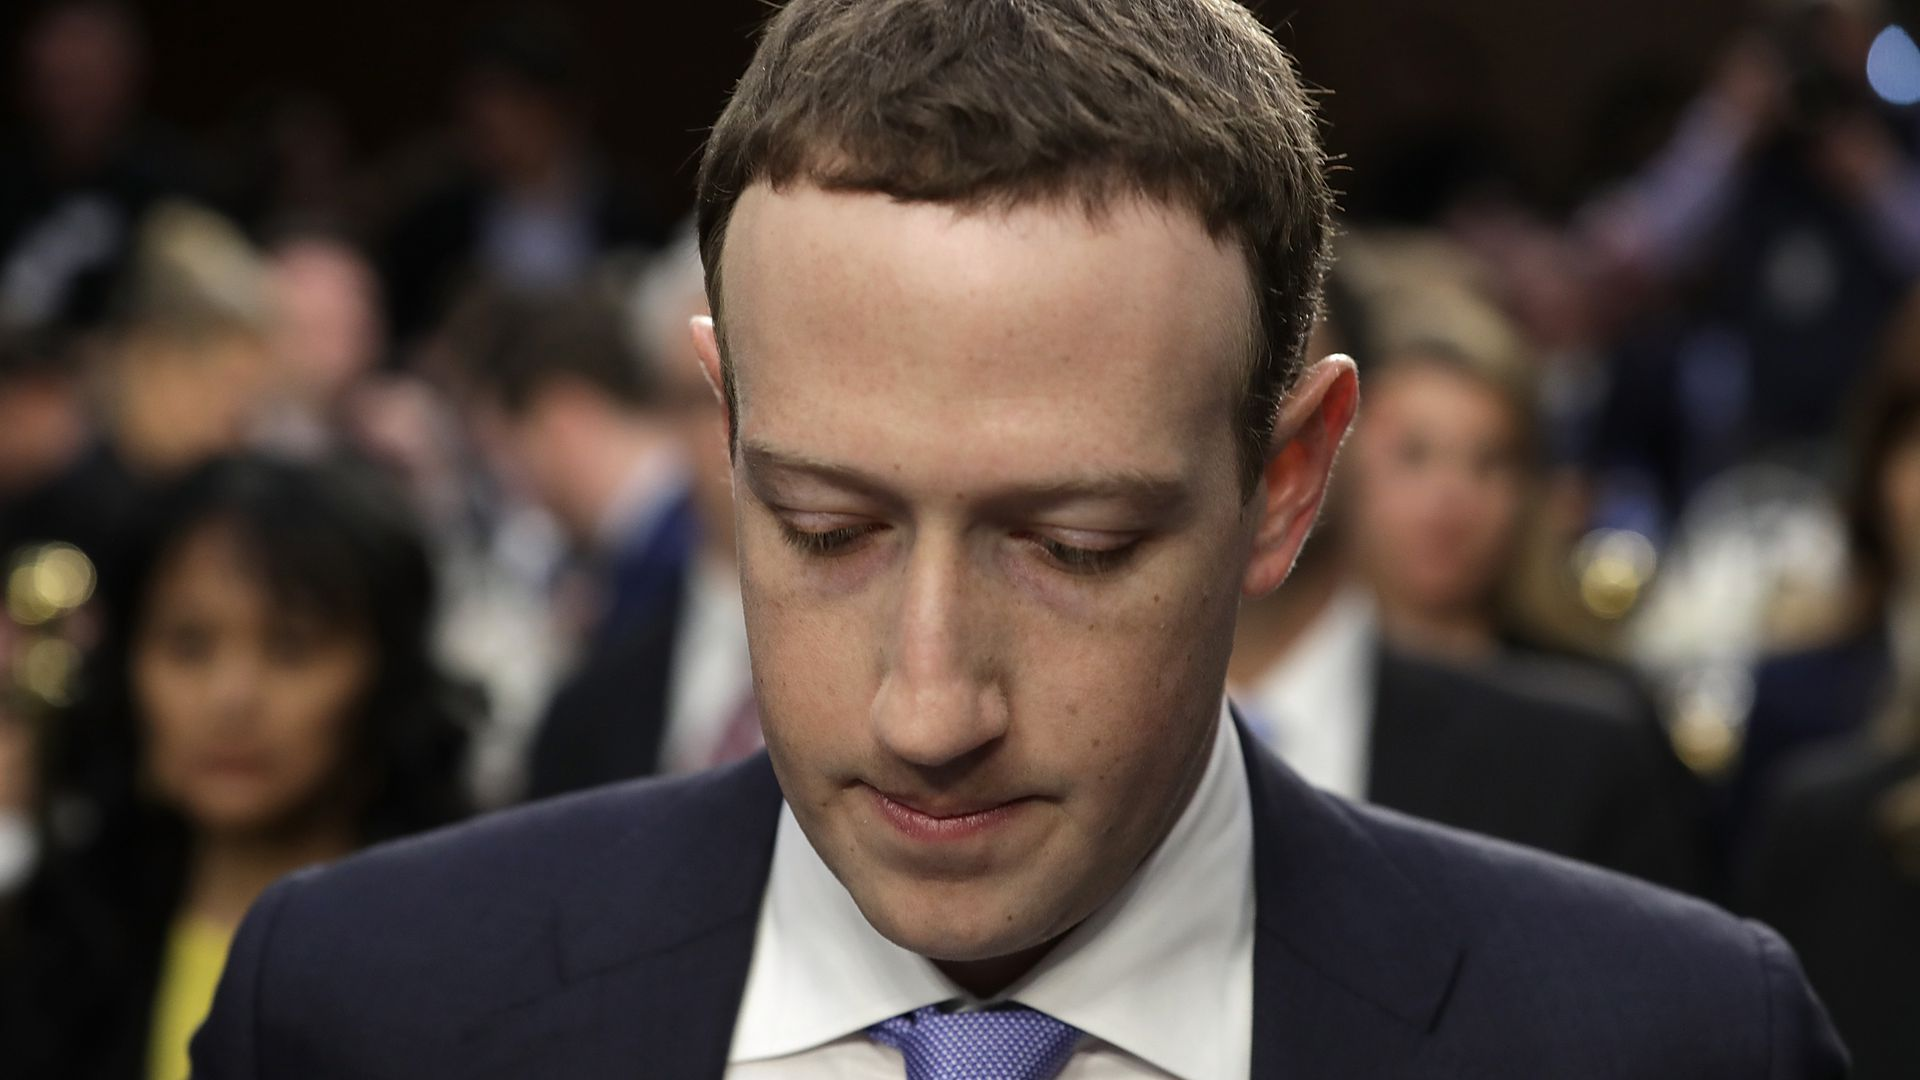 Mark Zuckerberg closeup